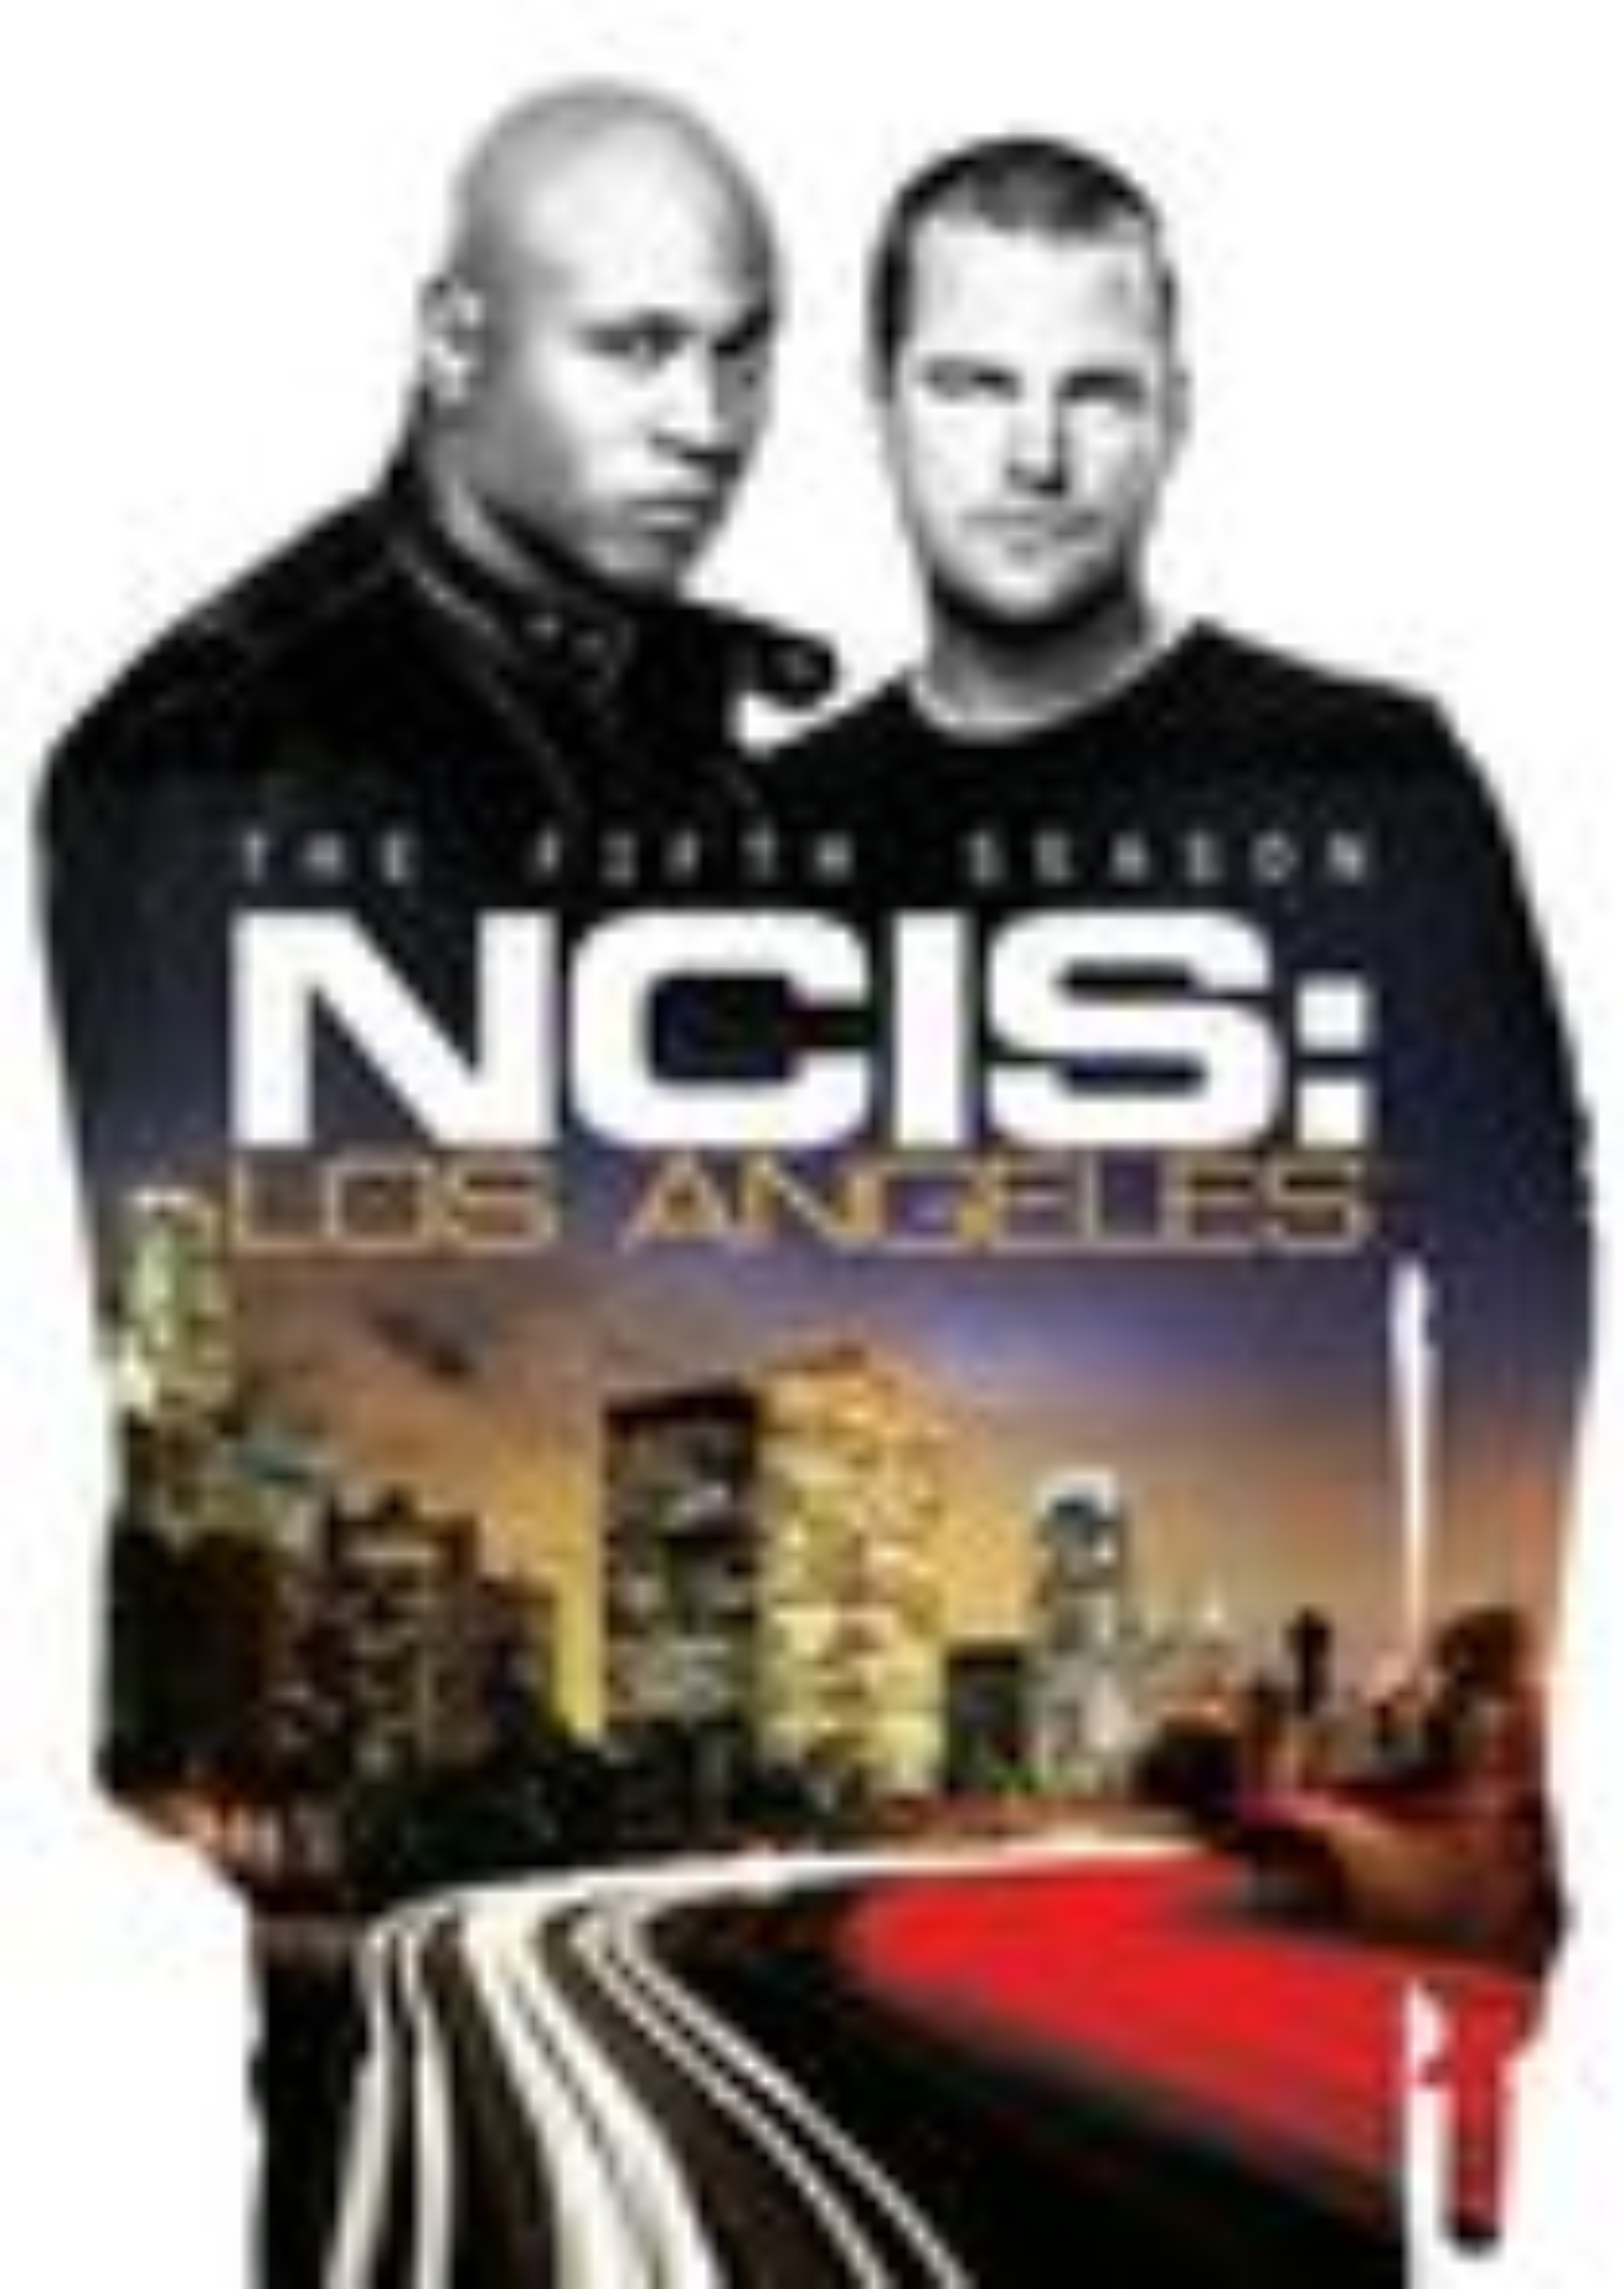 Ncis: Los Angeles - The Fifth Season [6 Discs] (dvd) 7310013